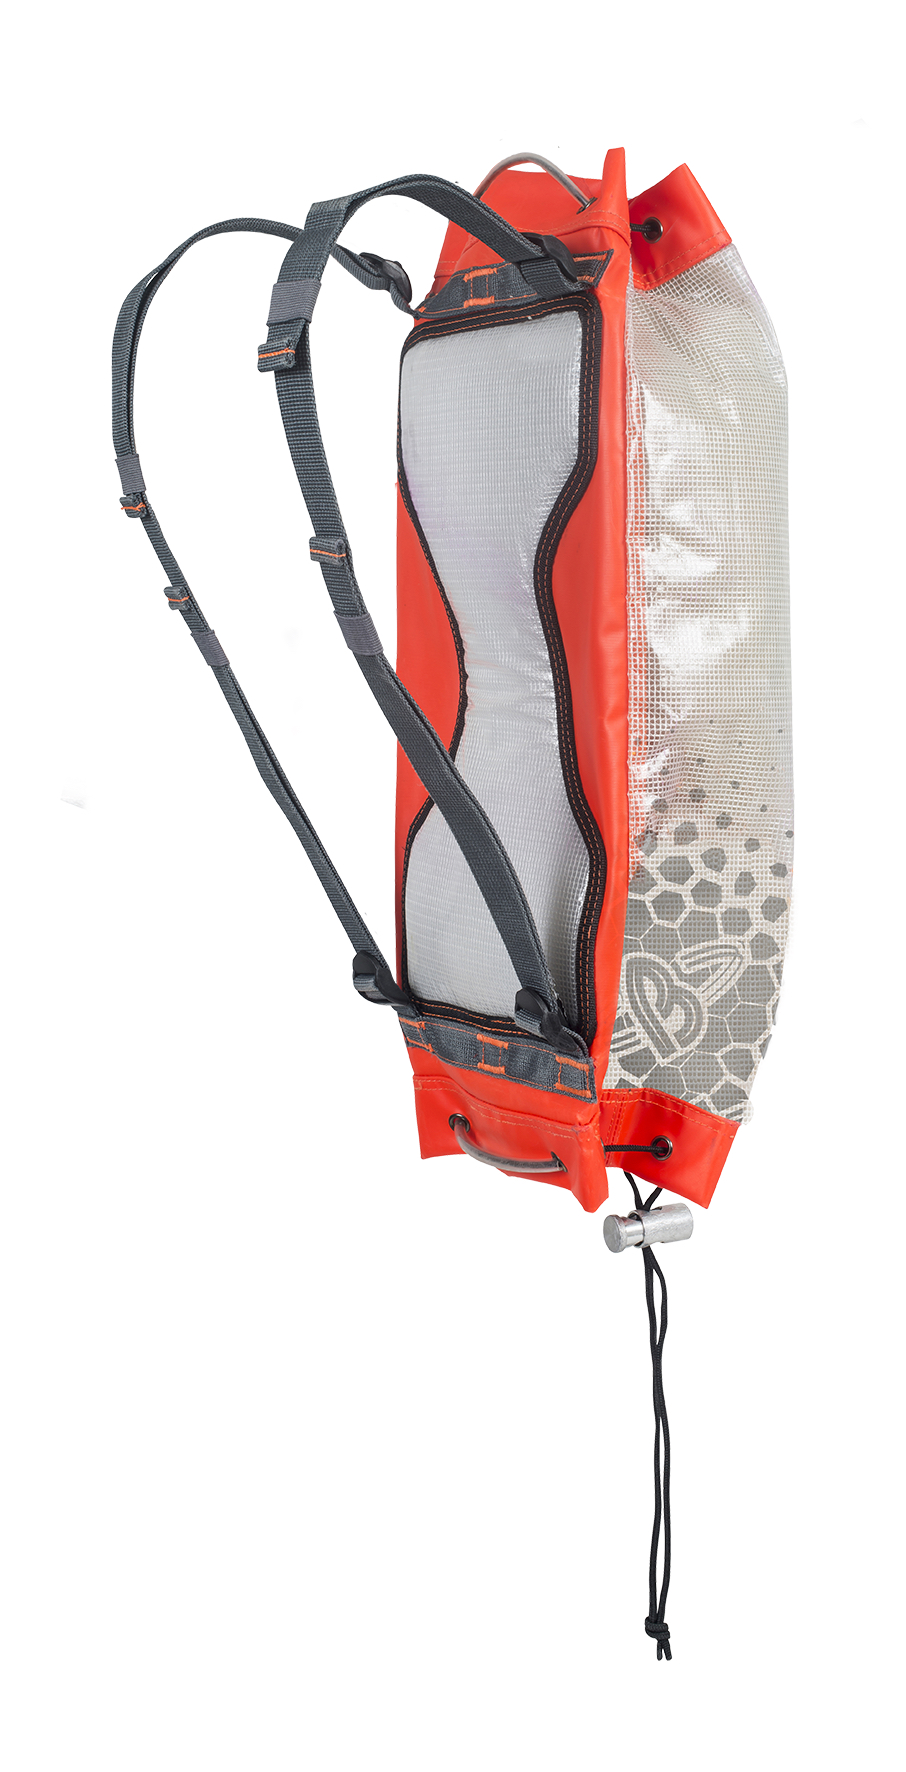 Beal - Swing Kit - Rope bag